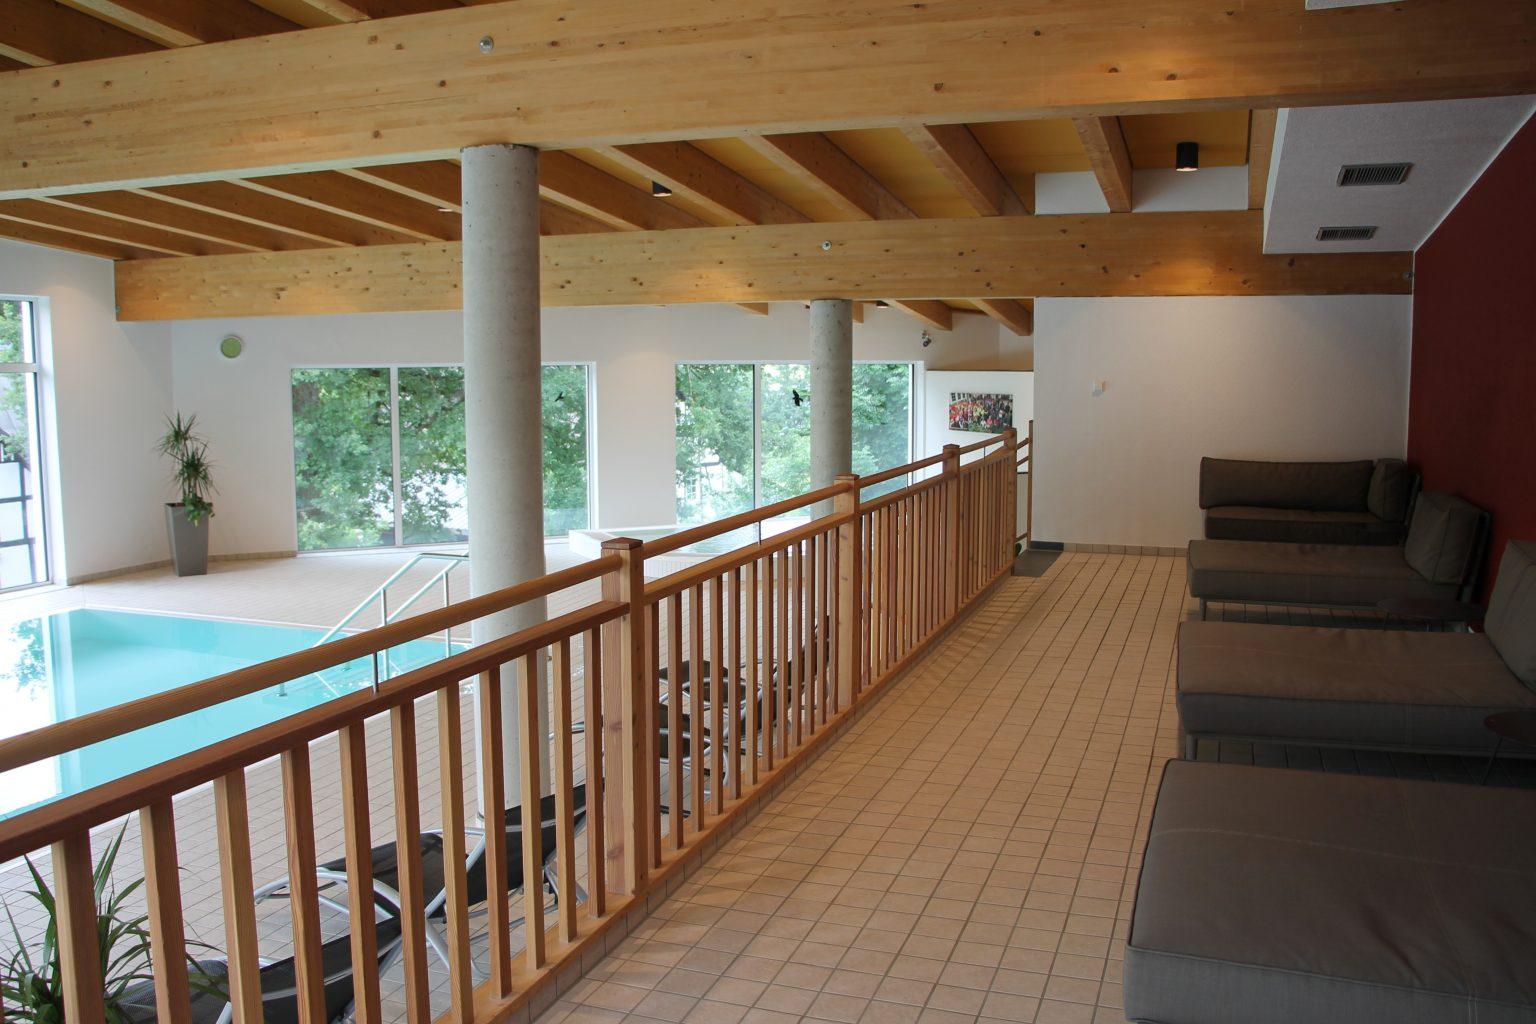 Ebbinghof Schwimmbad